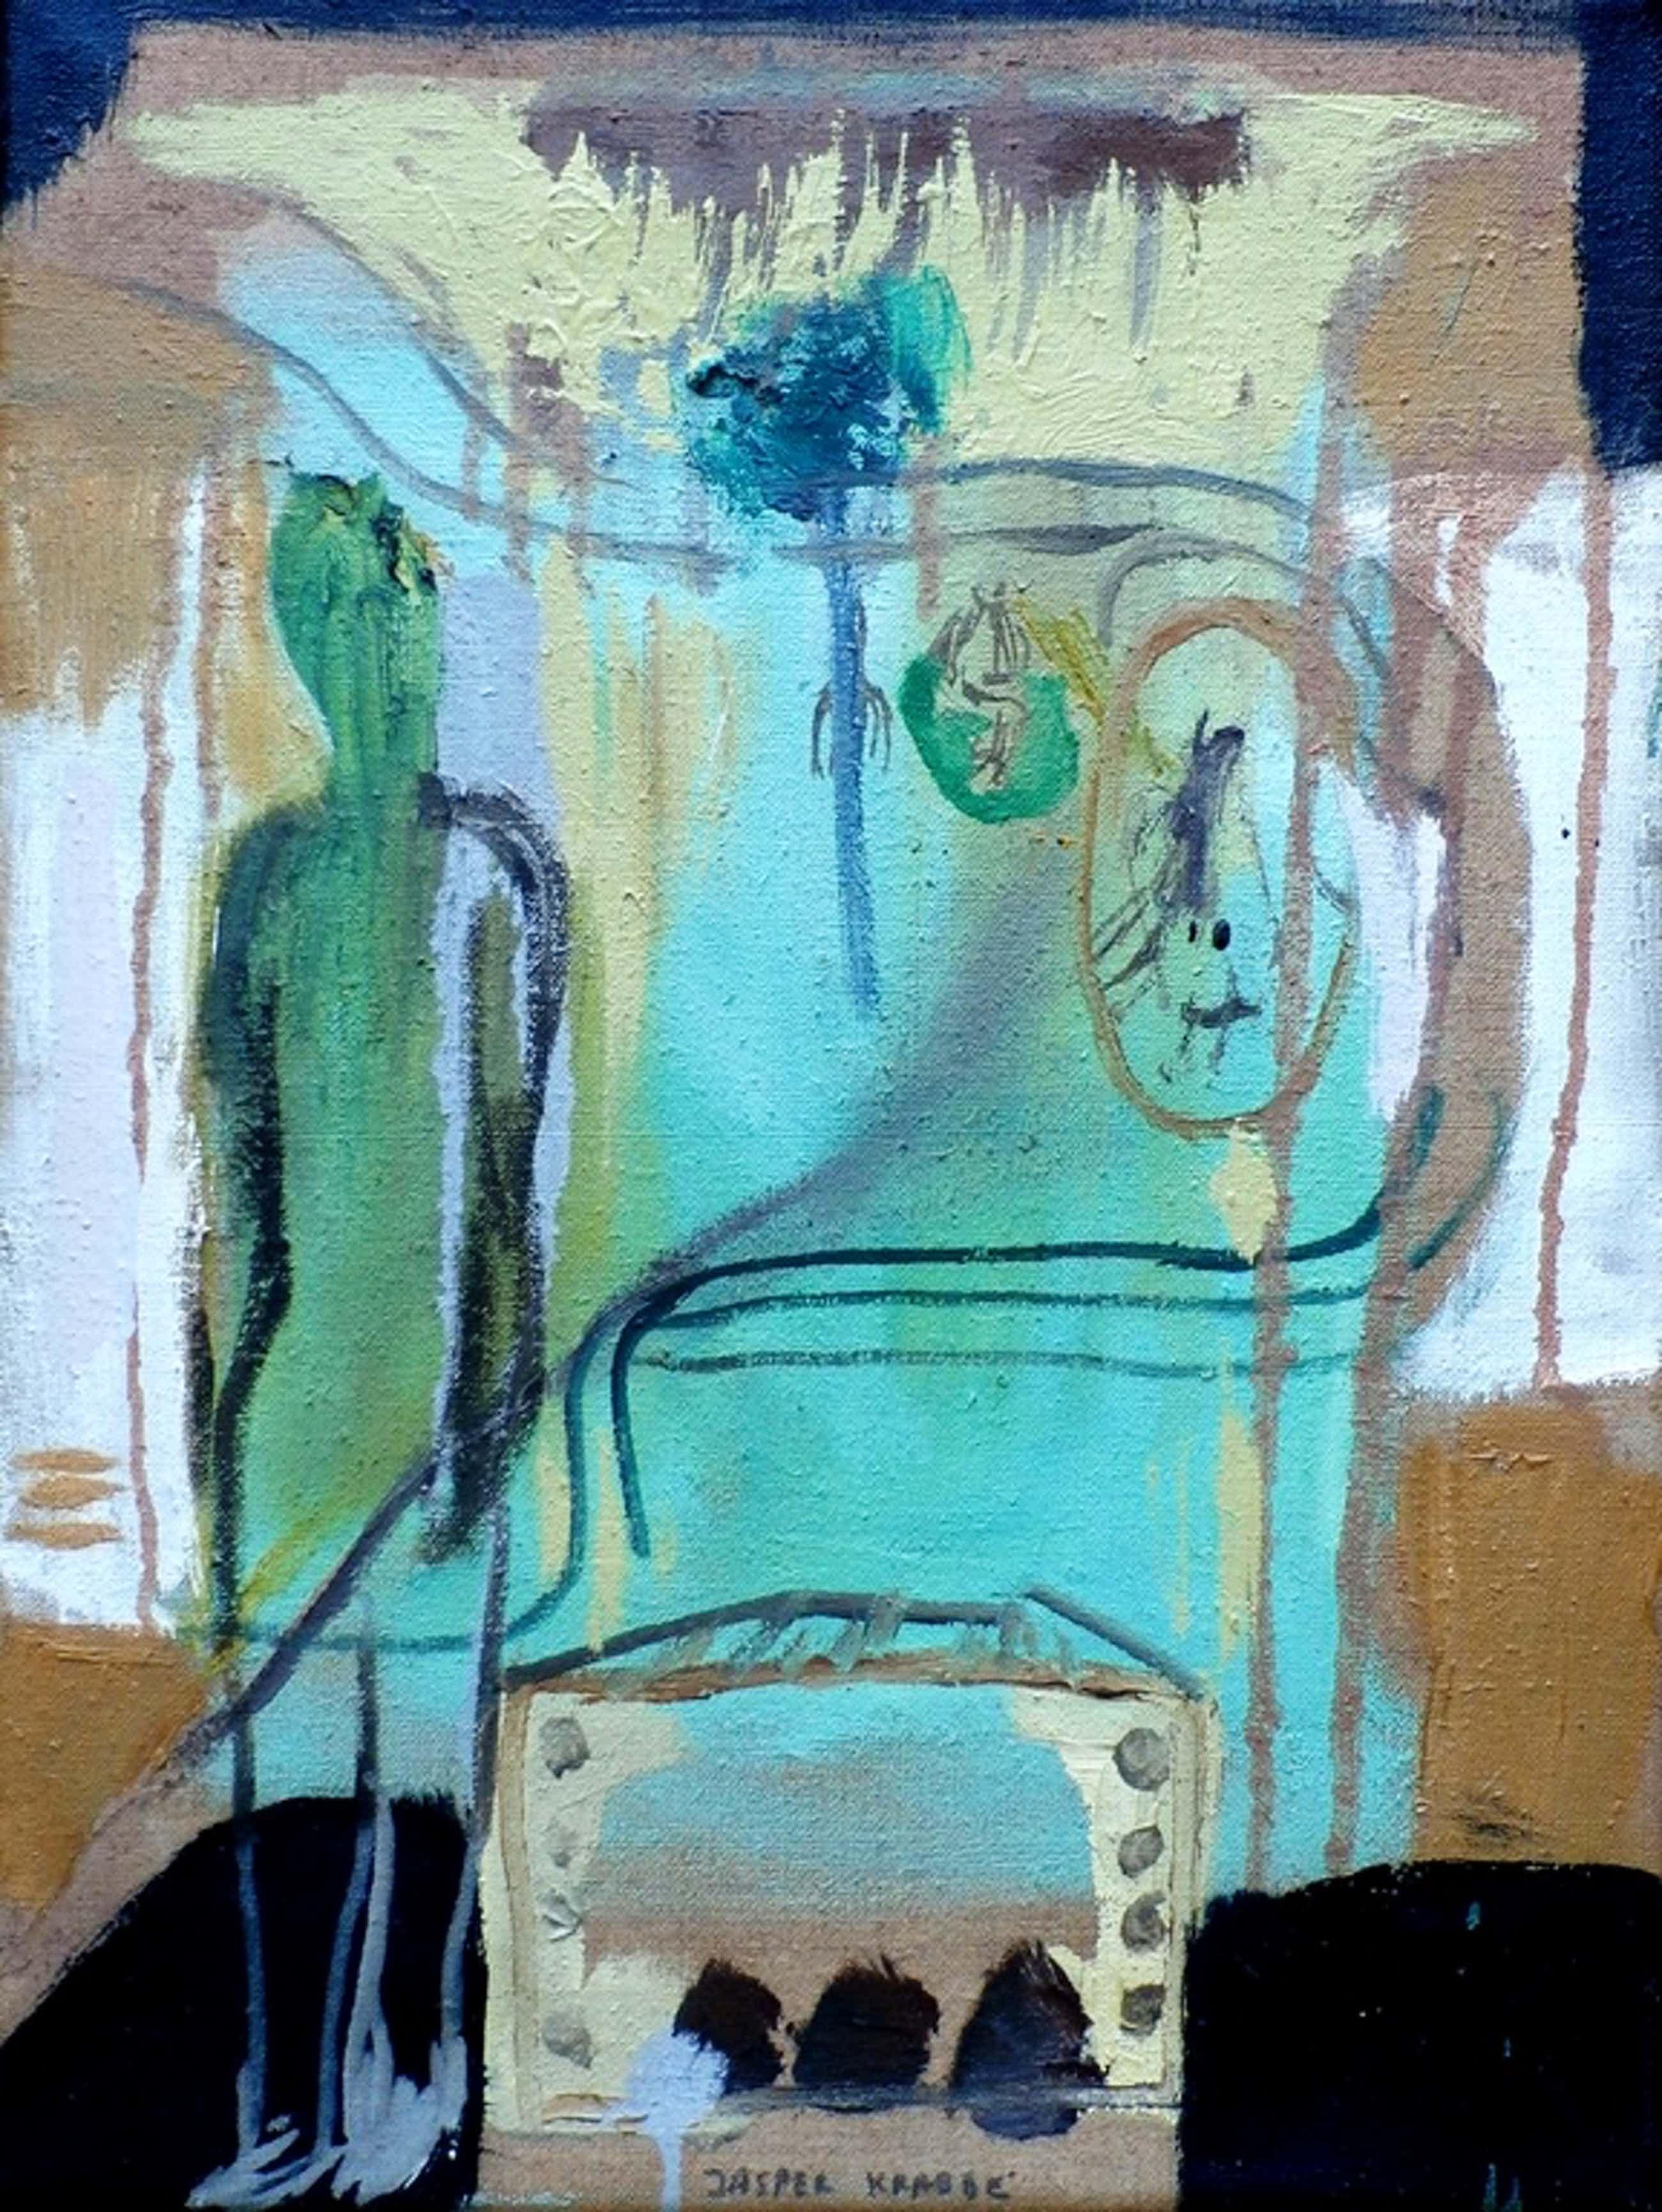 Jasper Krabbe - acrylverf op doek - 1995 kopen? Bied vanaf 1000!